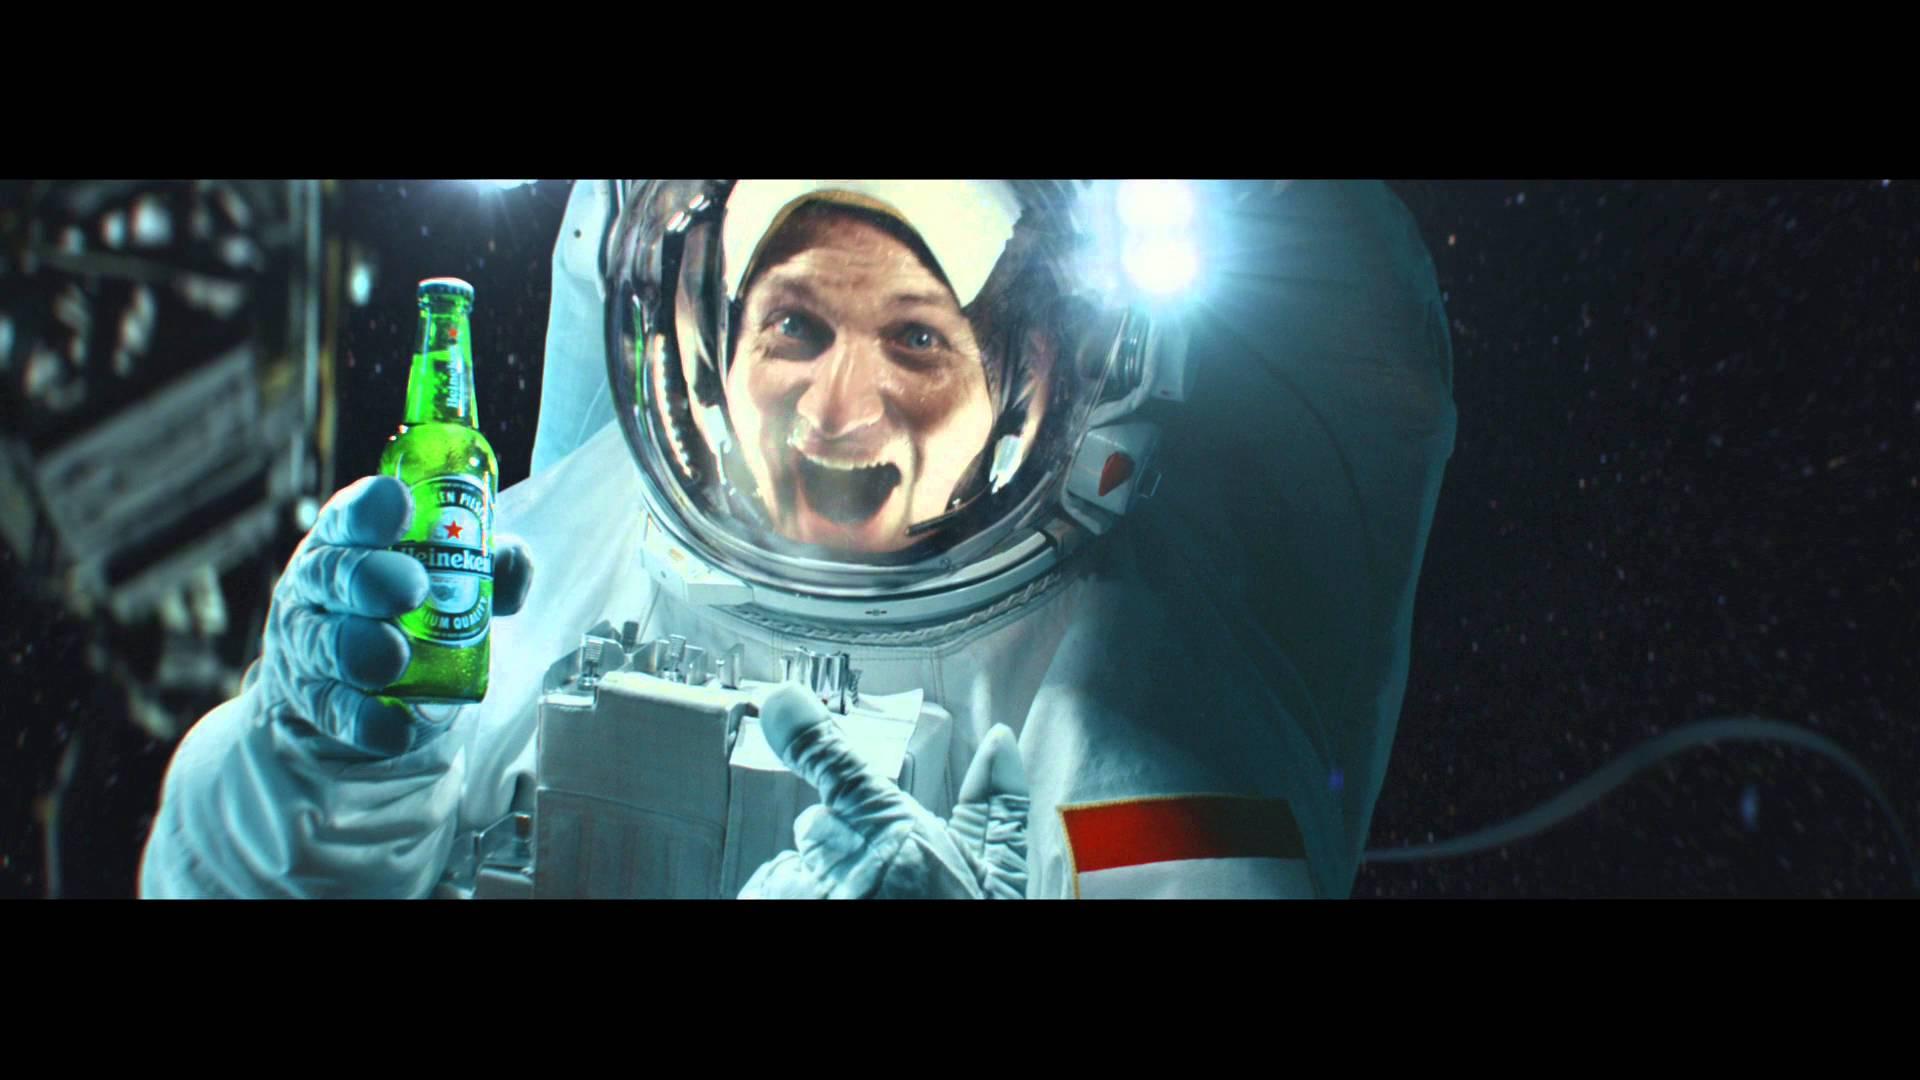 Heineken Christmas Commercial 2020 Song In Heineken Commercial 2020 Christmas   Psywps